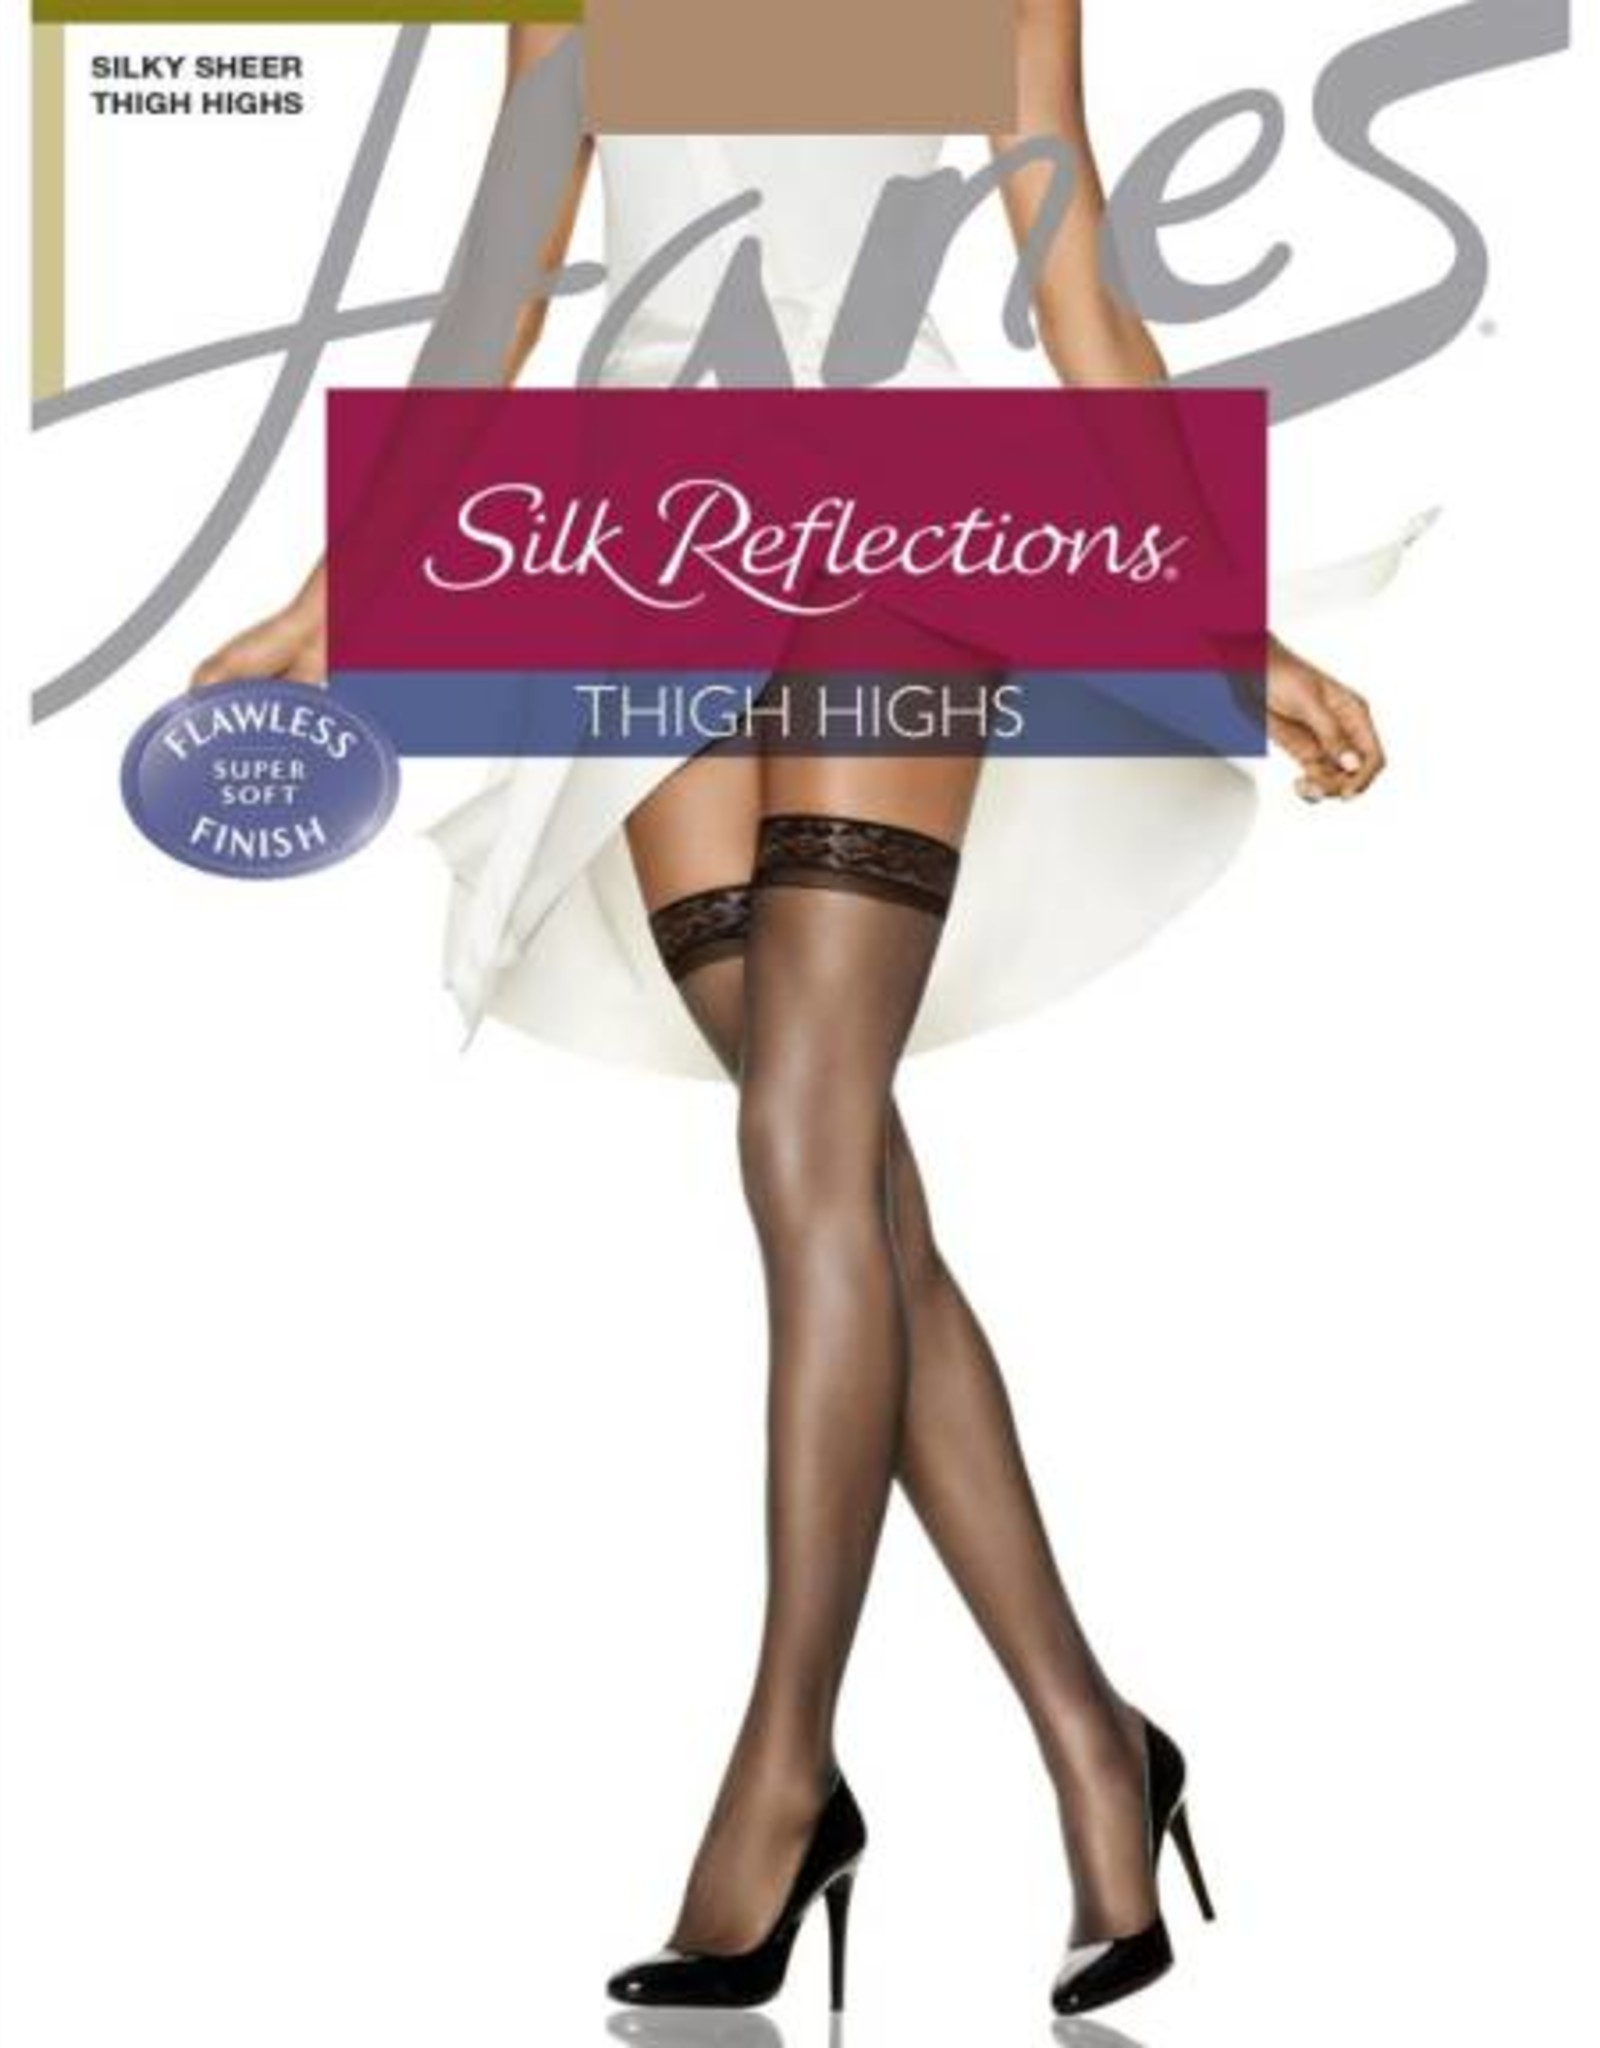 Hanes Hanes Silk Reflections Silky Sheer Thigh High